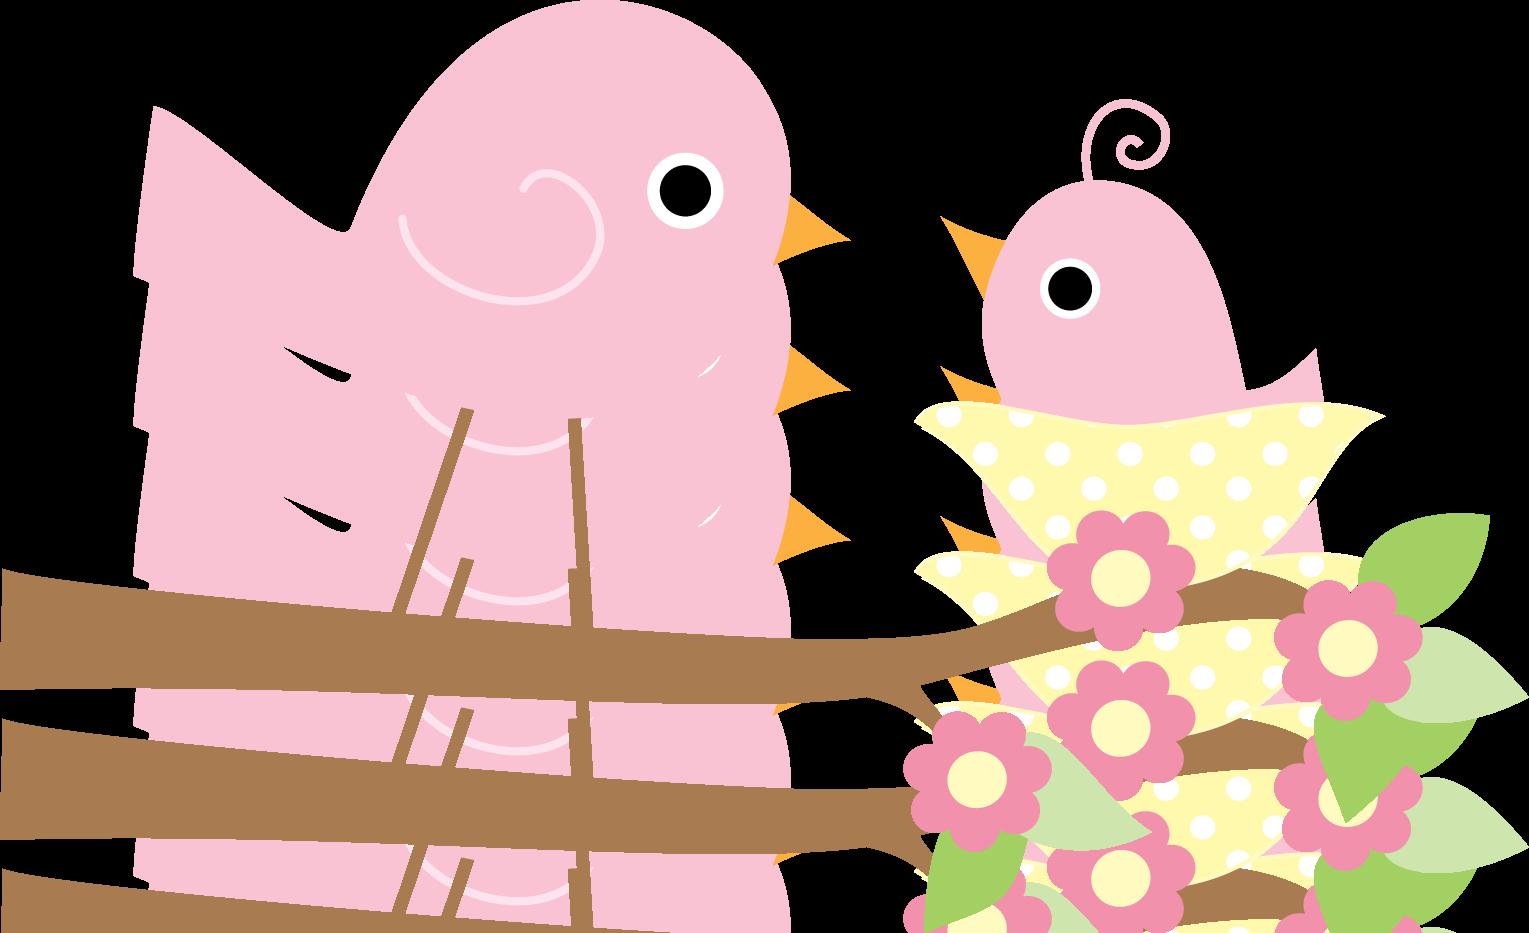 Baby bird eggs clipart picture royalty free download Bird nest Baby shower Bird egg Clip art - Bird png download - 1529 ... picture royalty free download